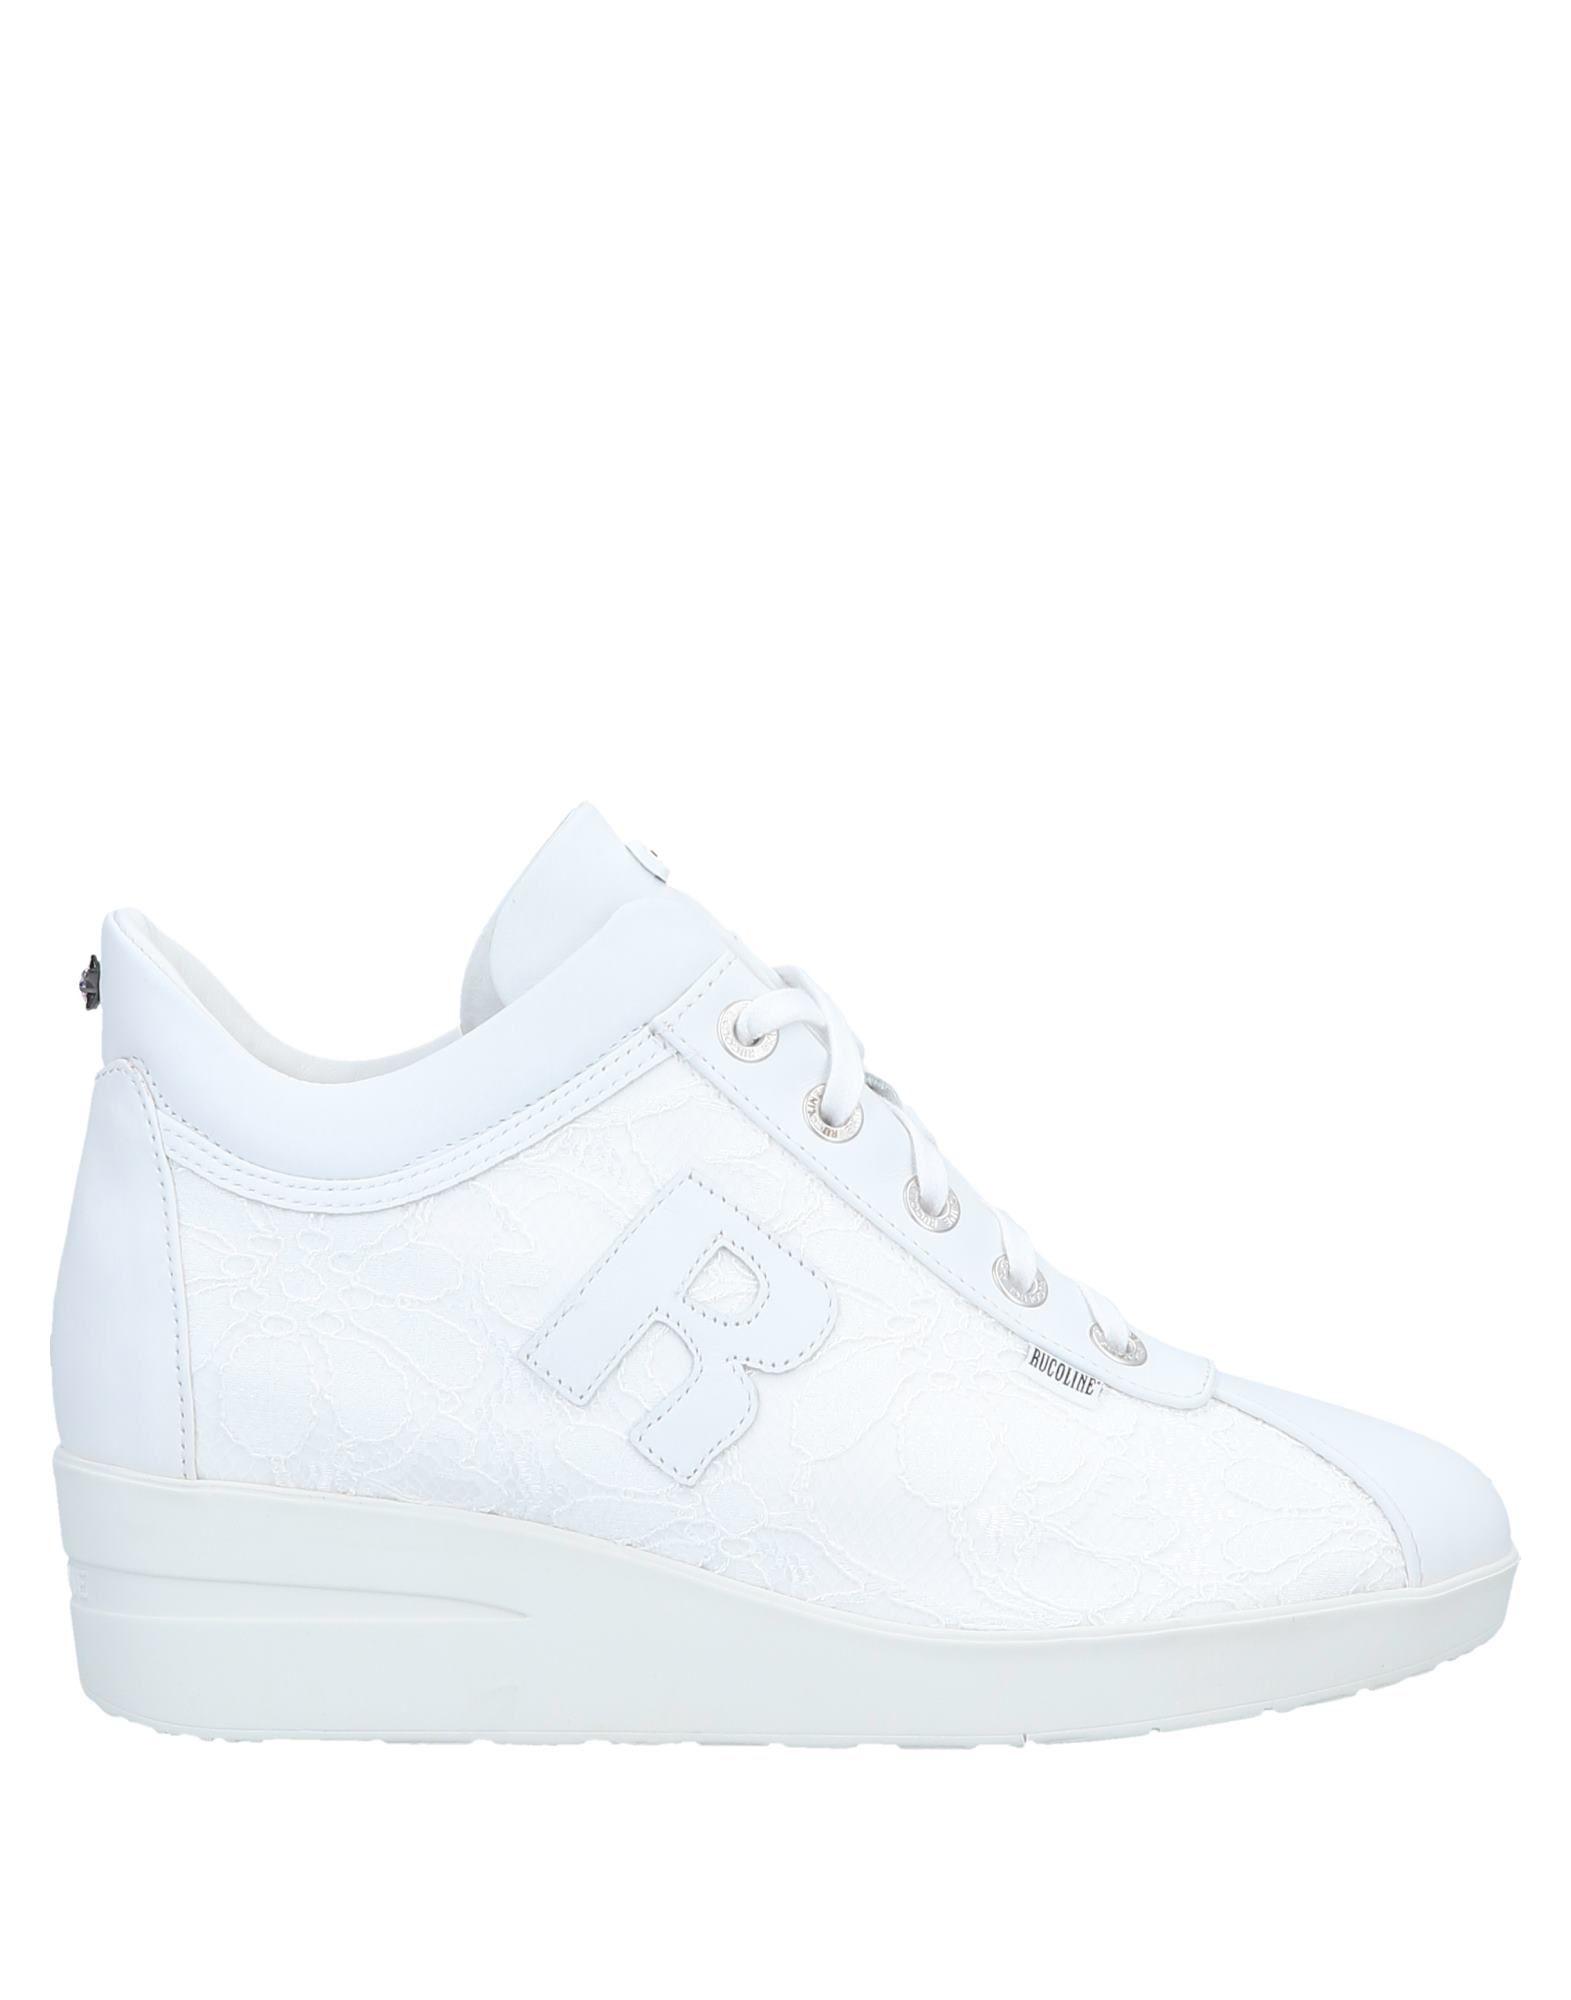 Ruco Line Sneakers - Women Ruco Line Sneakers - online on  Canada - Sneakers 11559535FN efde1b